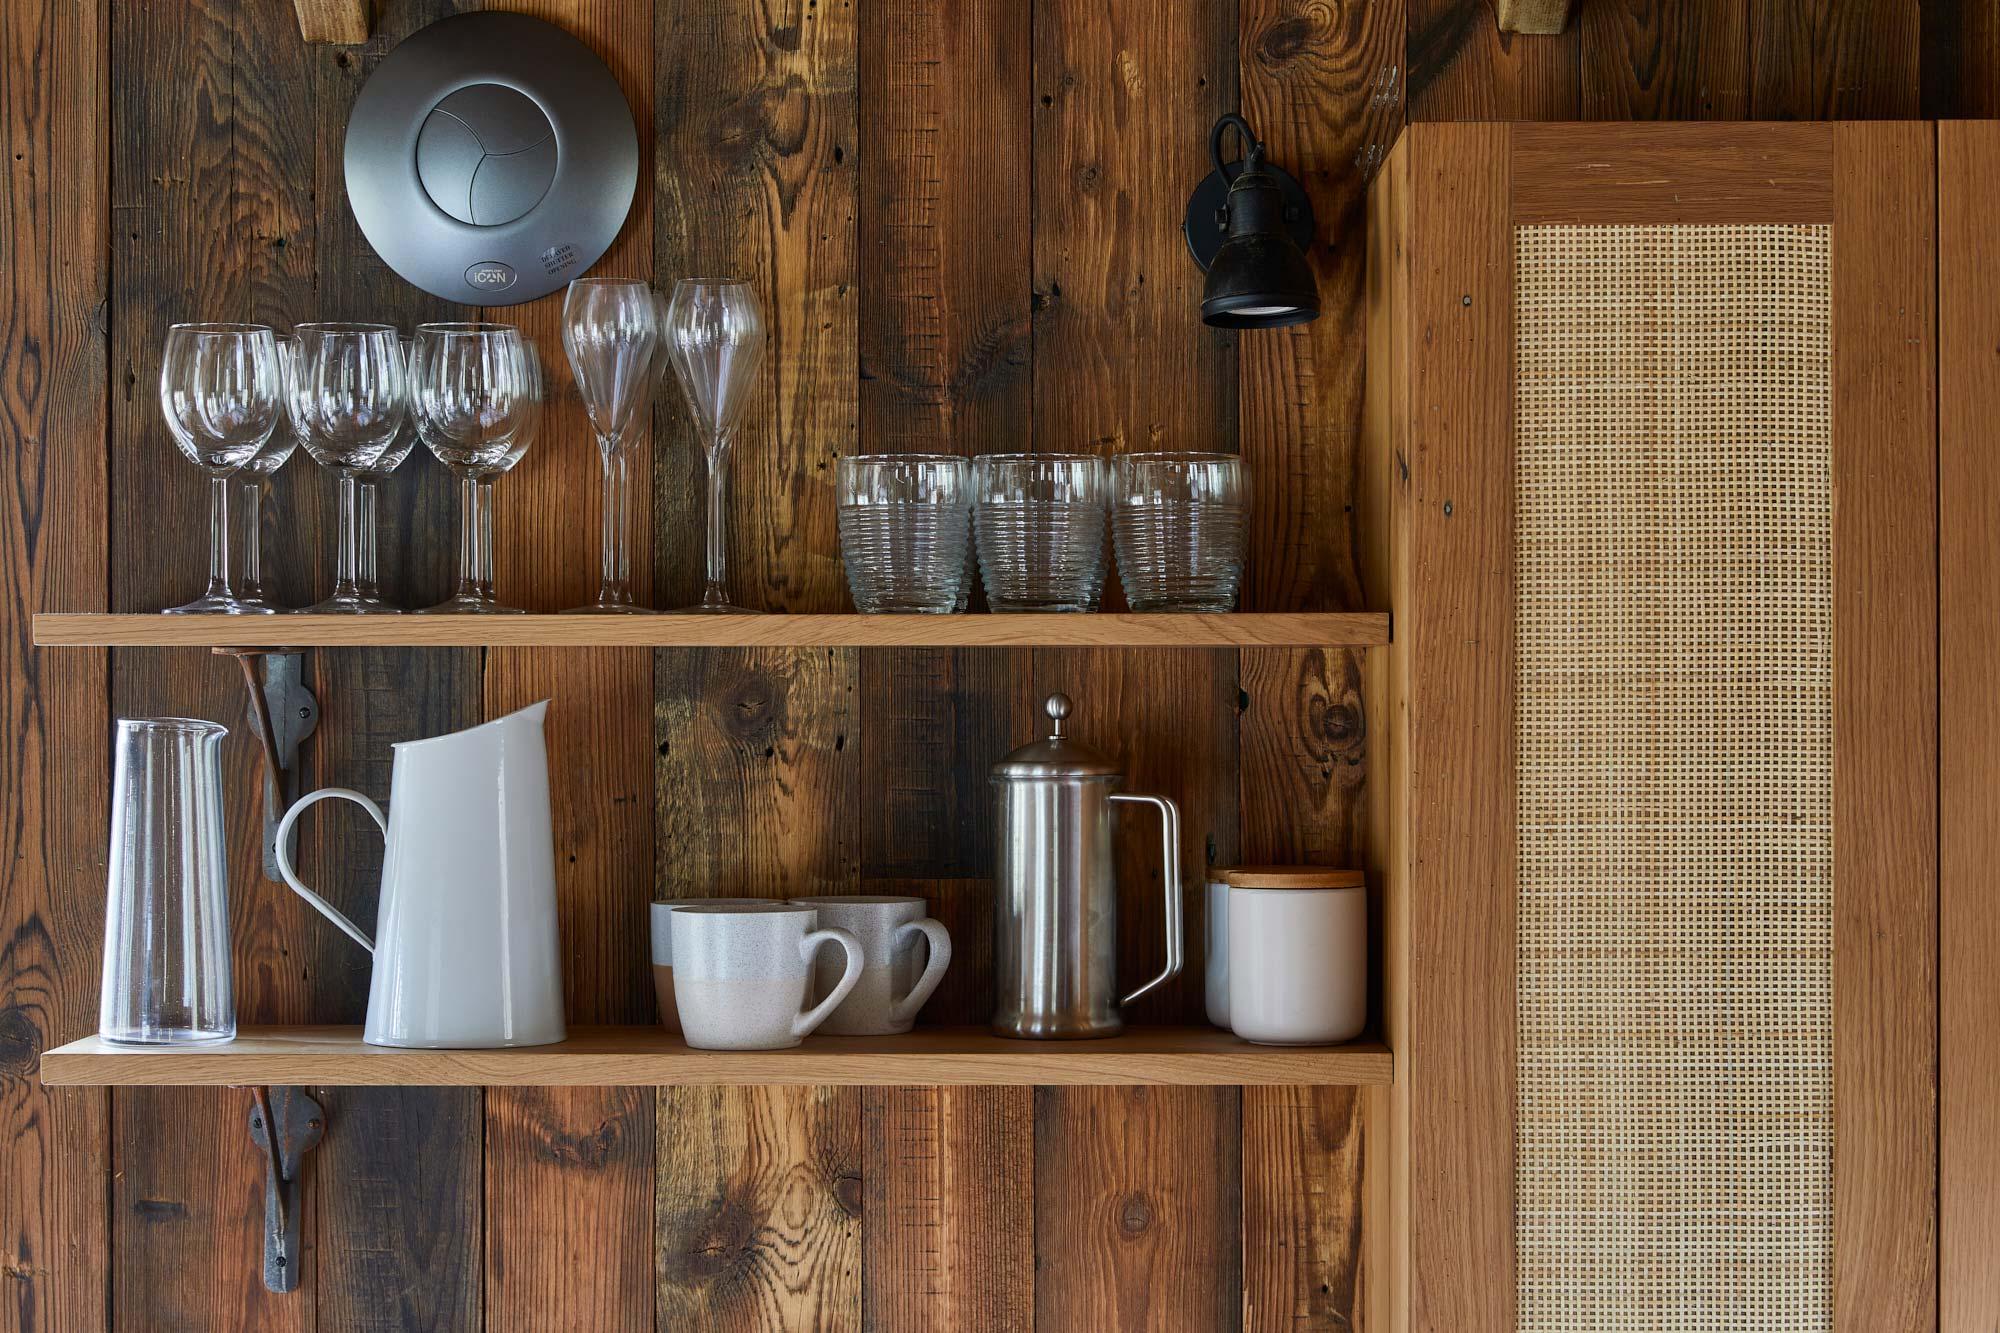 Rustic oak shelves